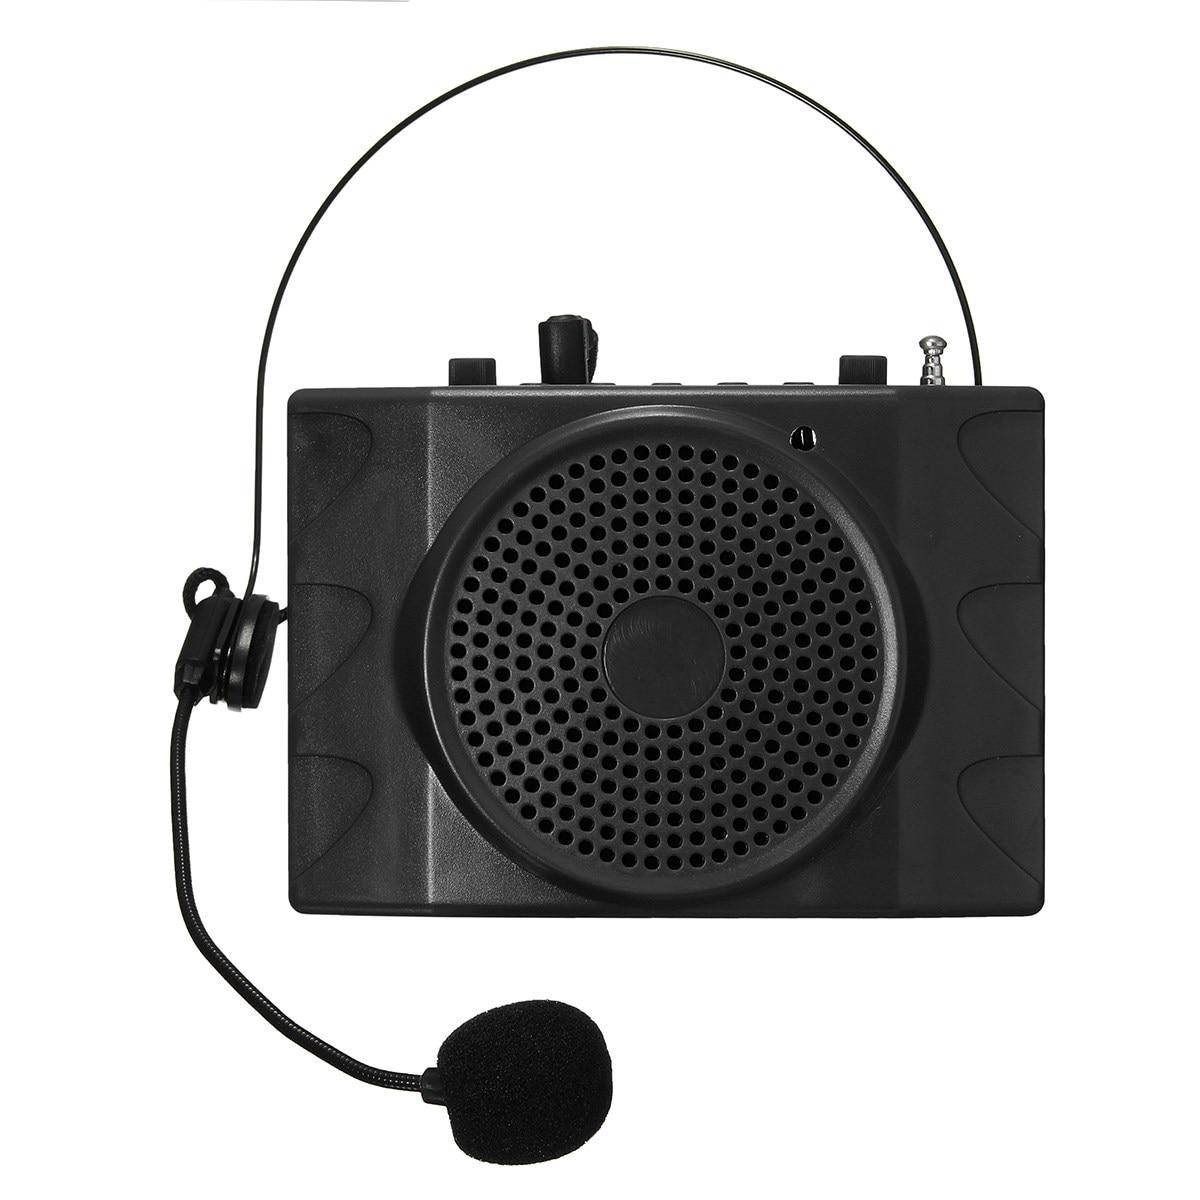 Brand ELEGIANT Multifunctional Megaphone Speaker With Mic FM Radio Loudspeaker Dedicated High-Power Amplifier Hanging Waist Belt